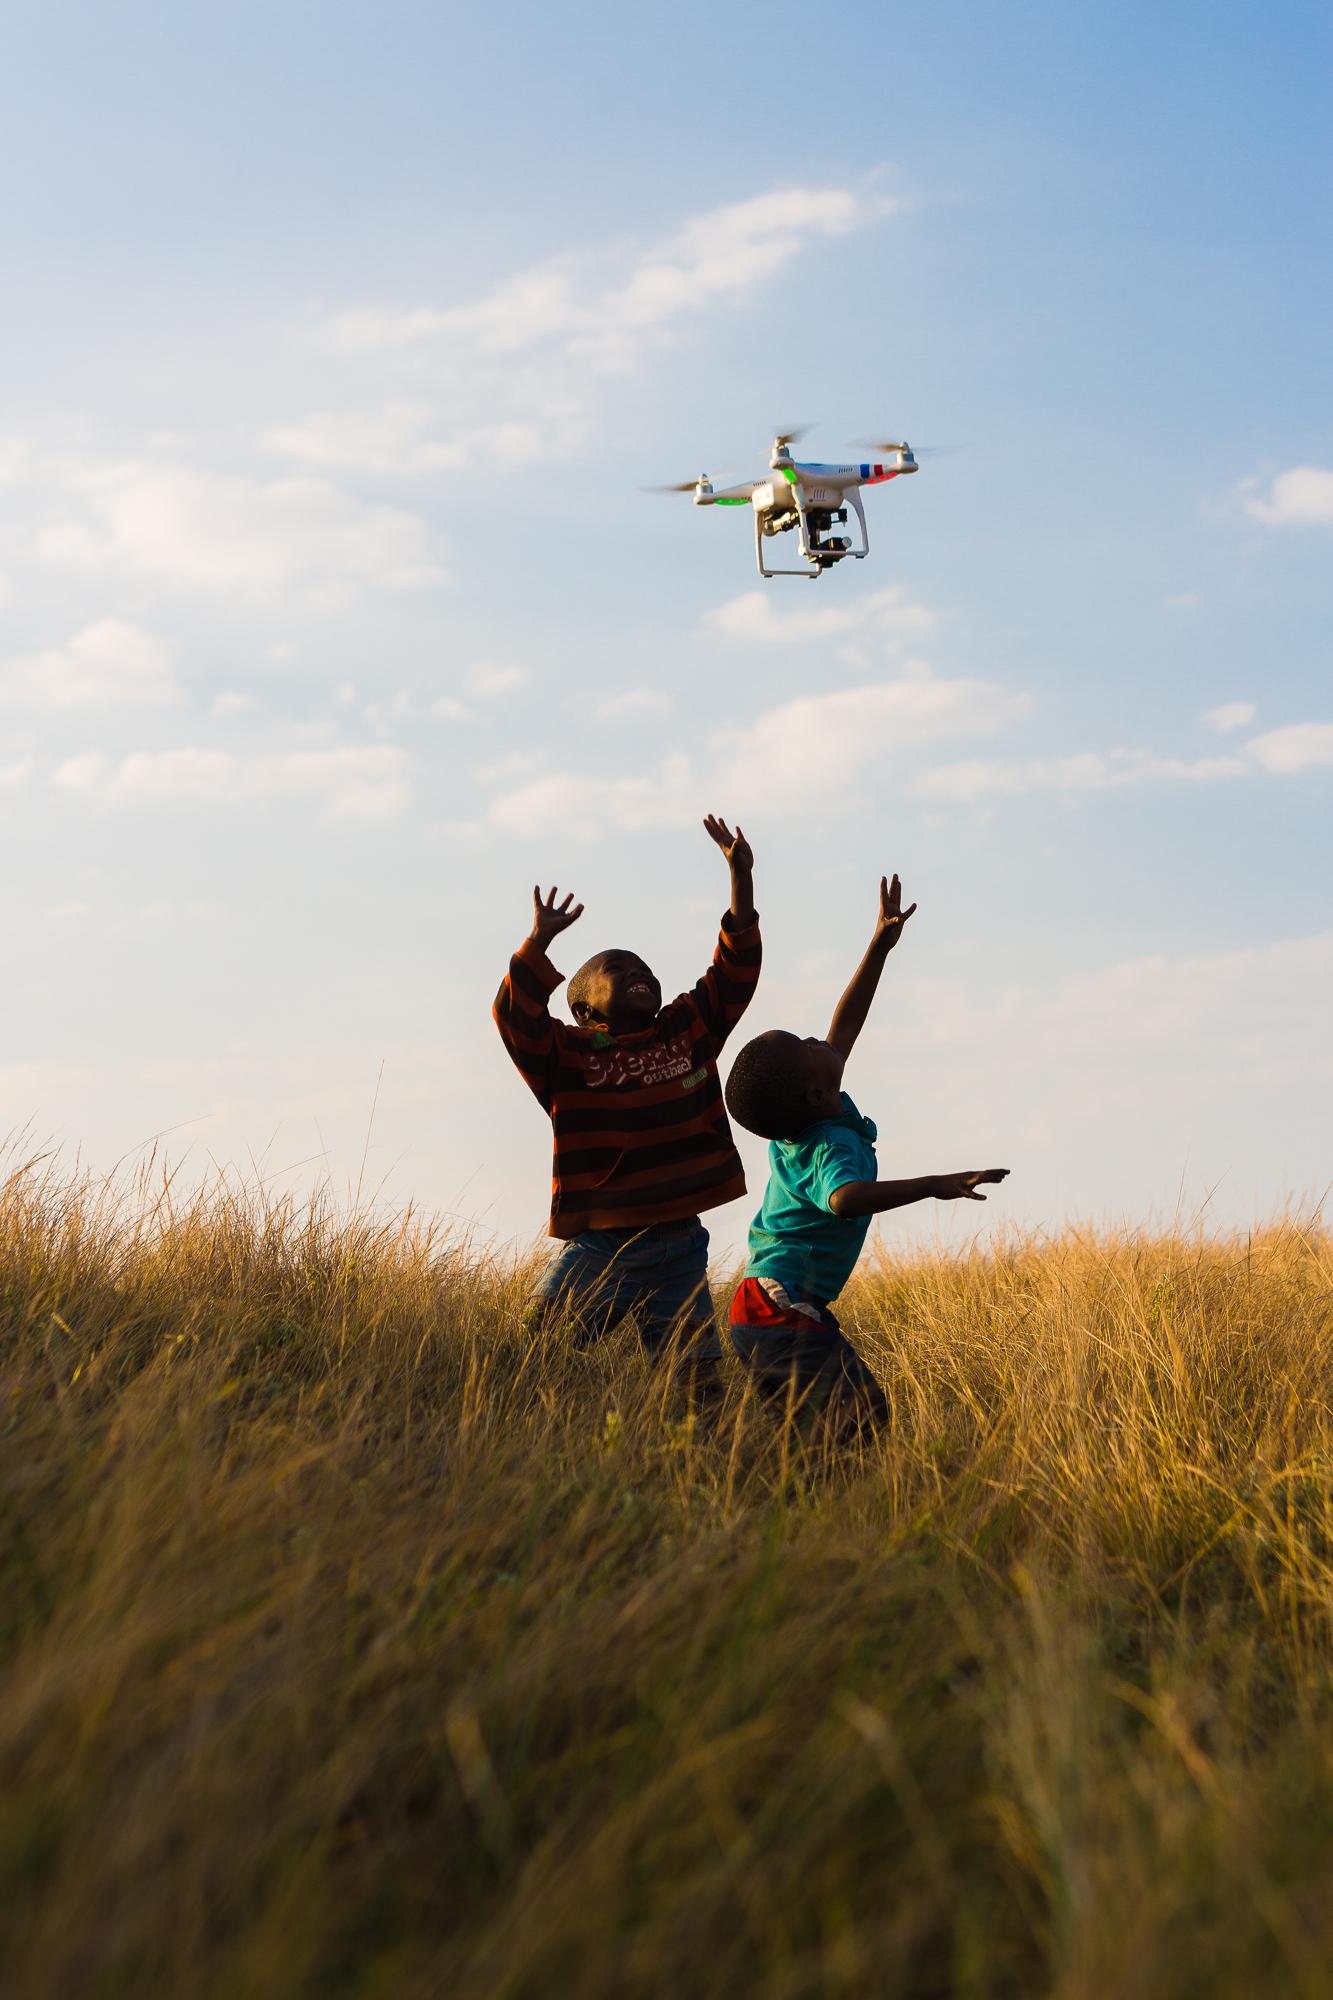 Promotion drone sport, avis aero drone